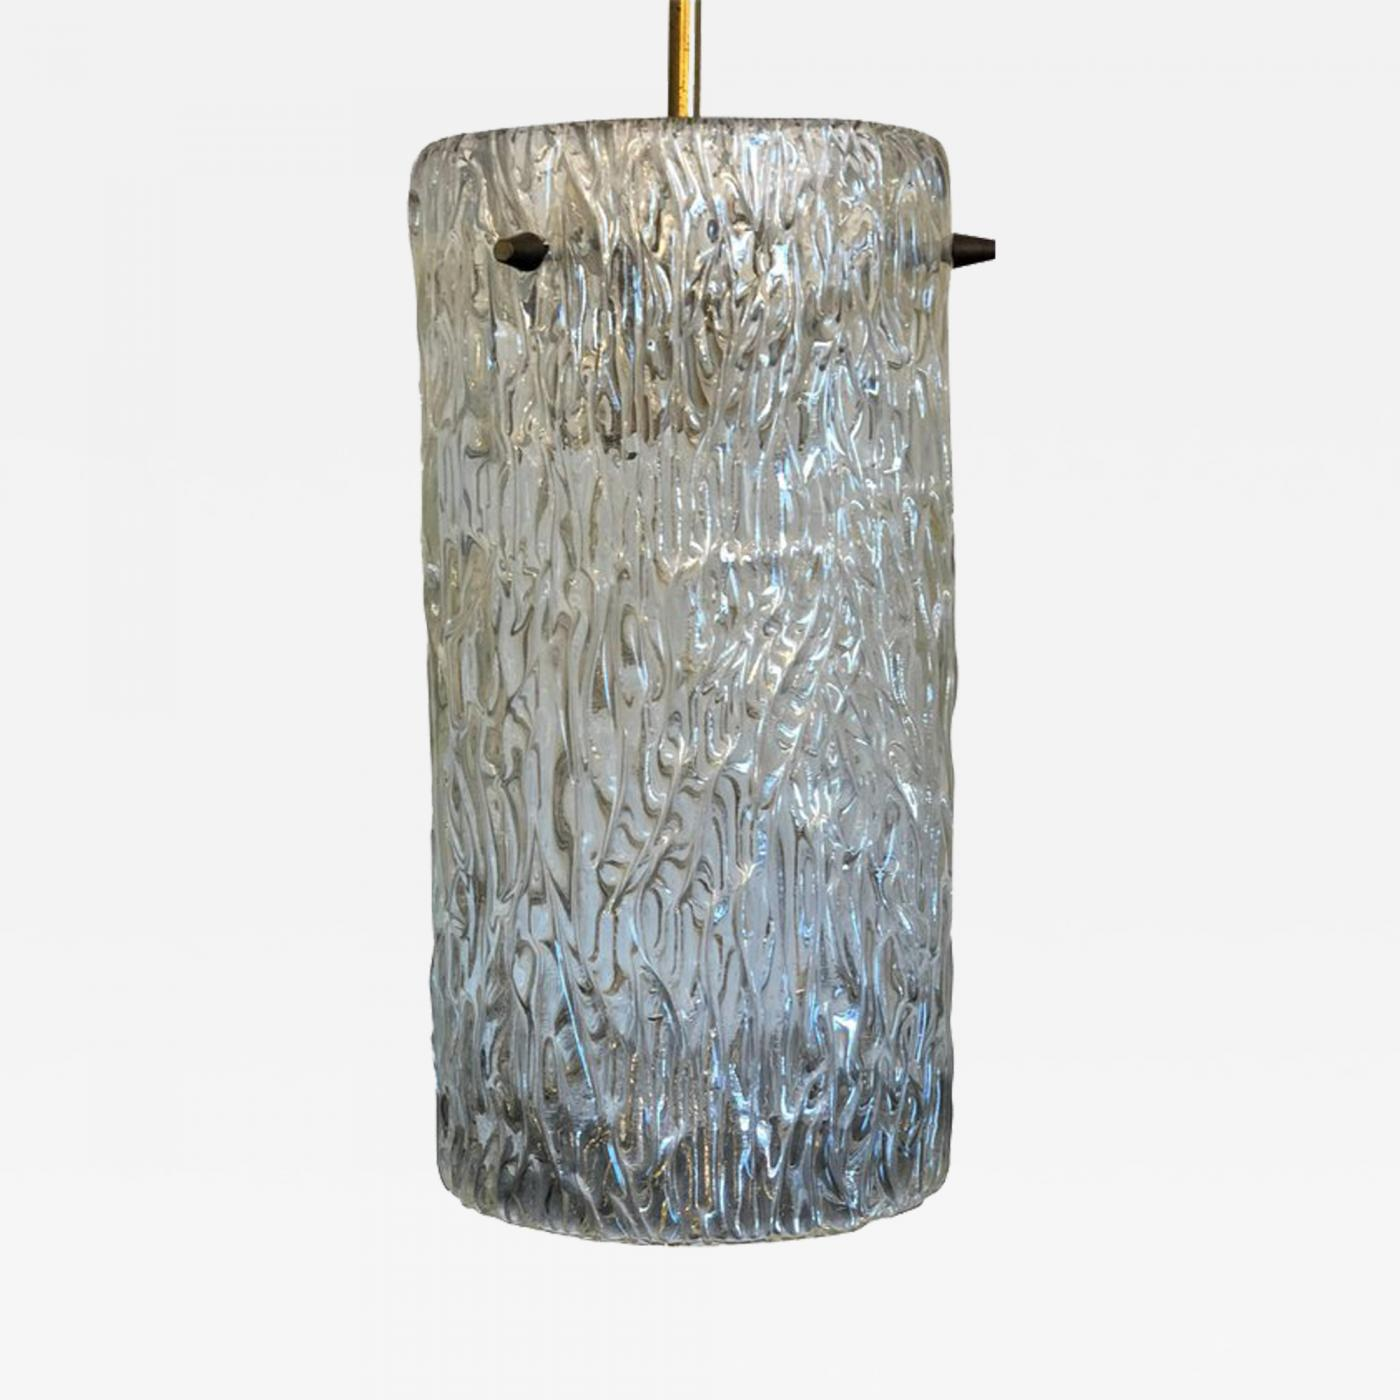 Listings Furniture Lighting Chandeliers And Pendants Kalmar Mid Century